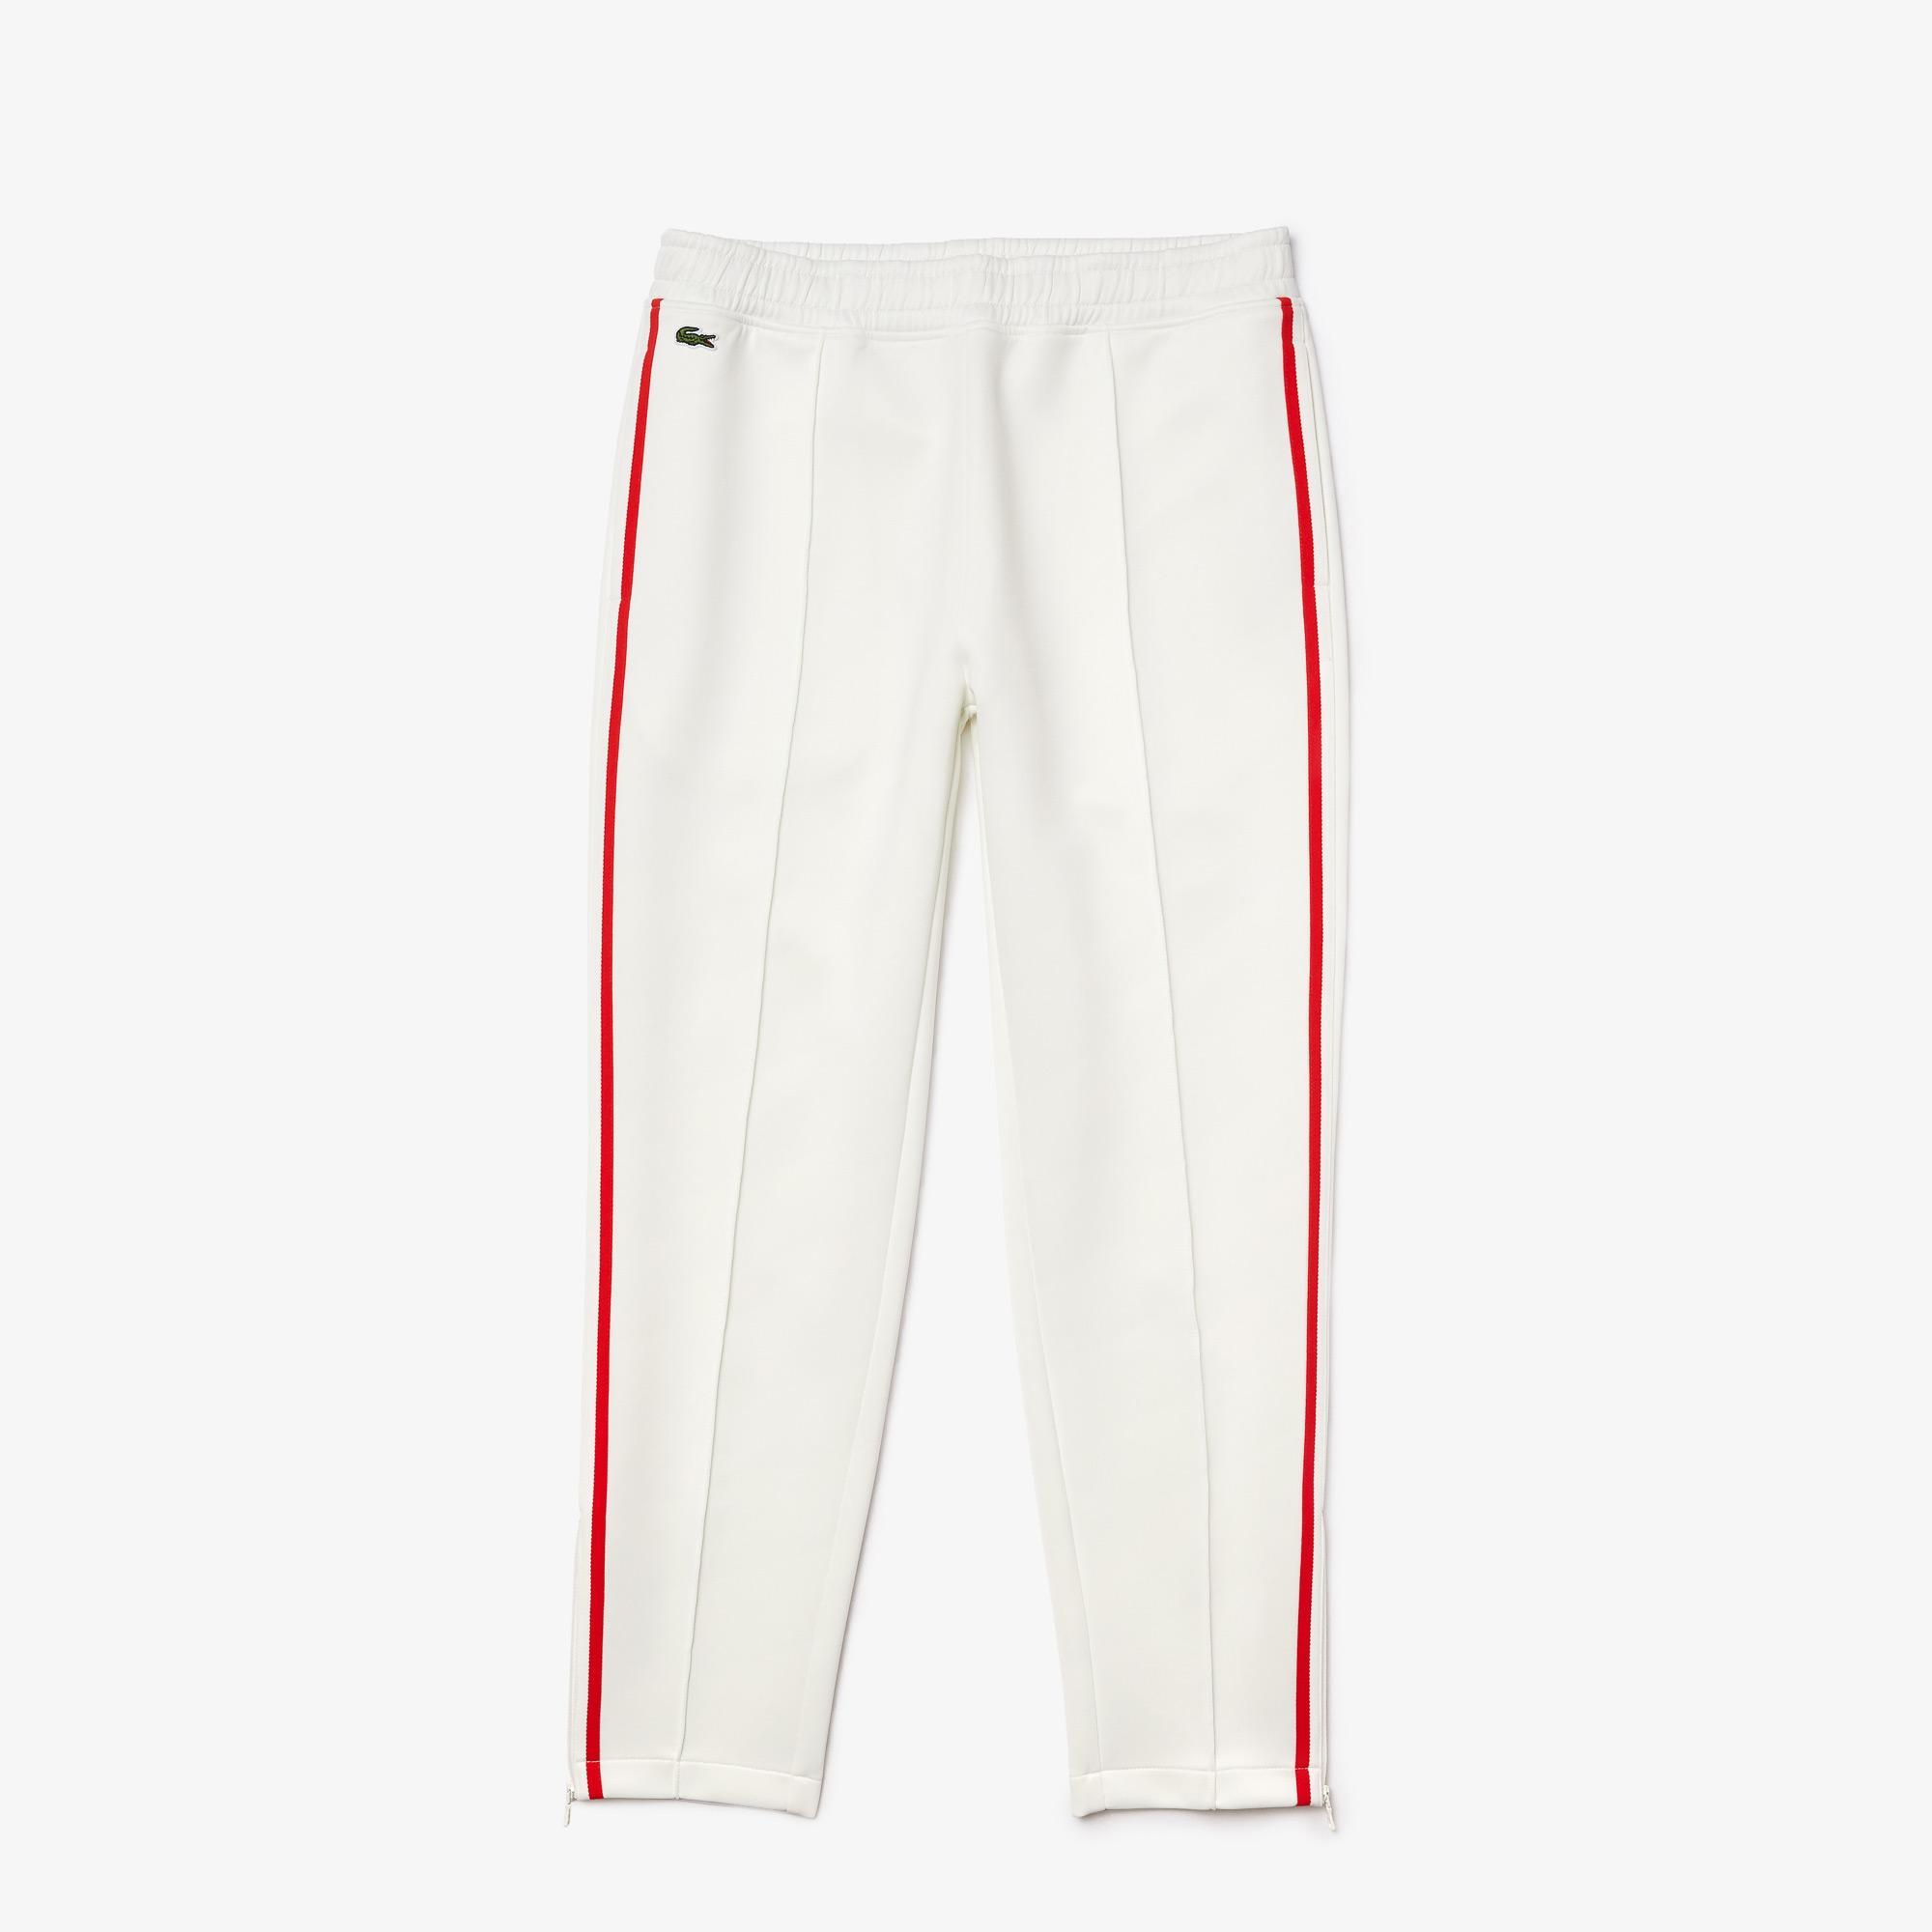 Lacoste Women's Straight Cut Contrast Bands Tracksuit Pants